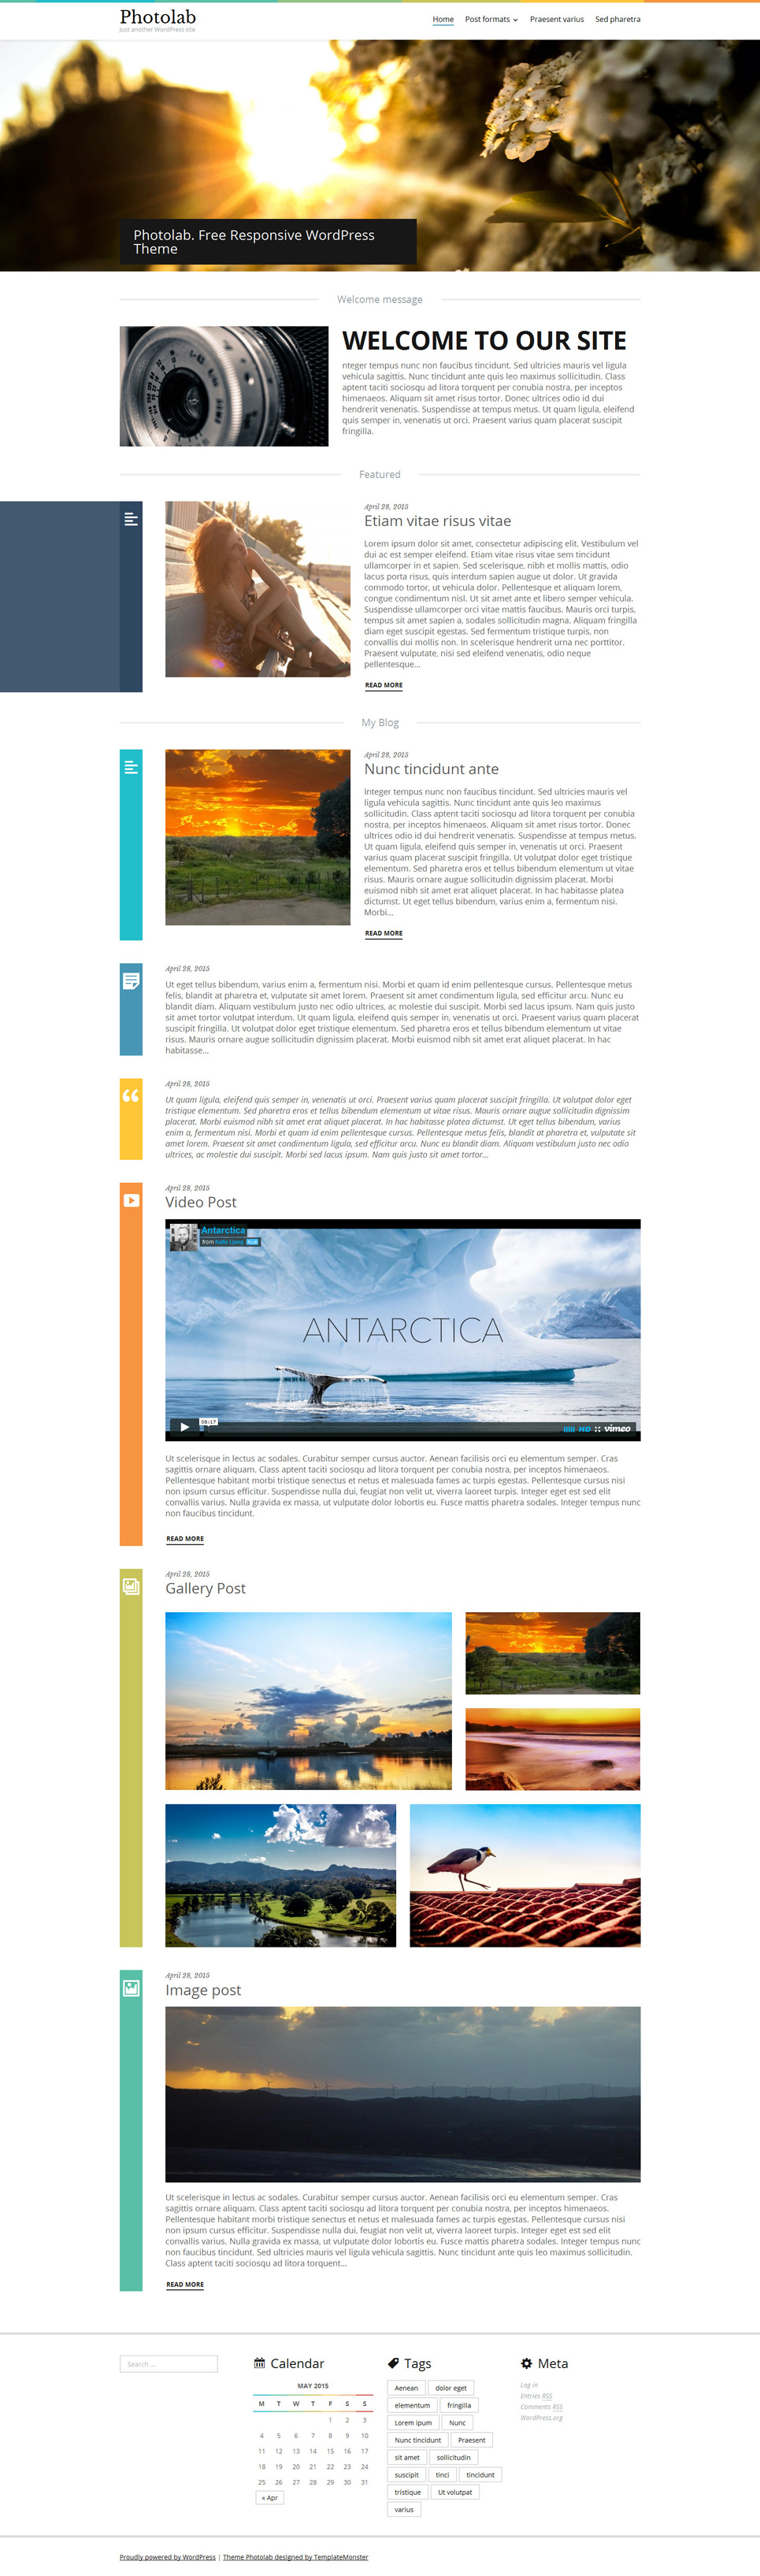 PhotoLab Responsive WordPress Theme